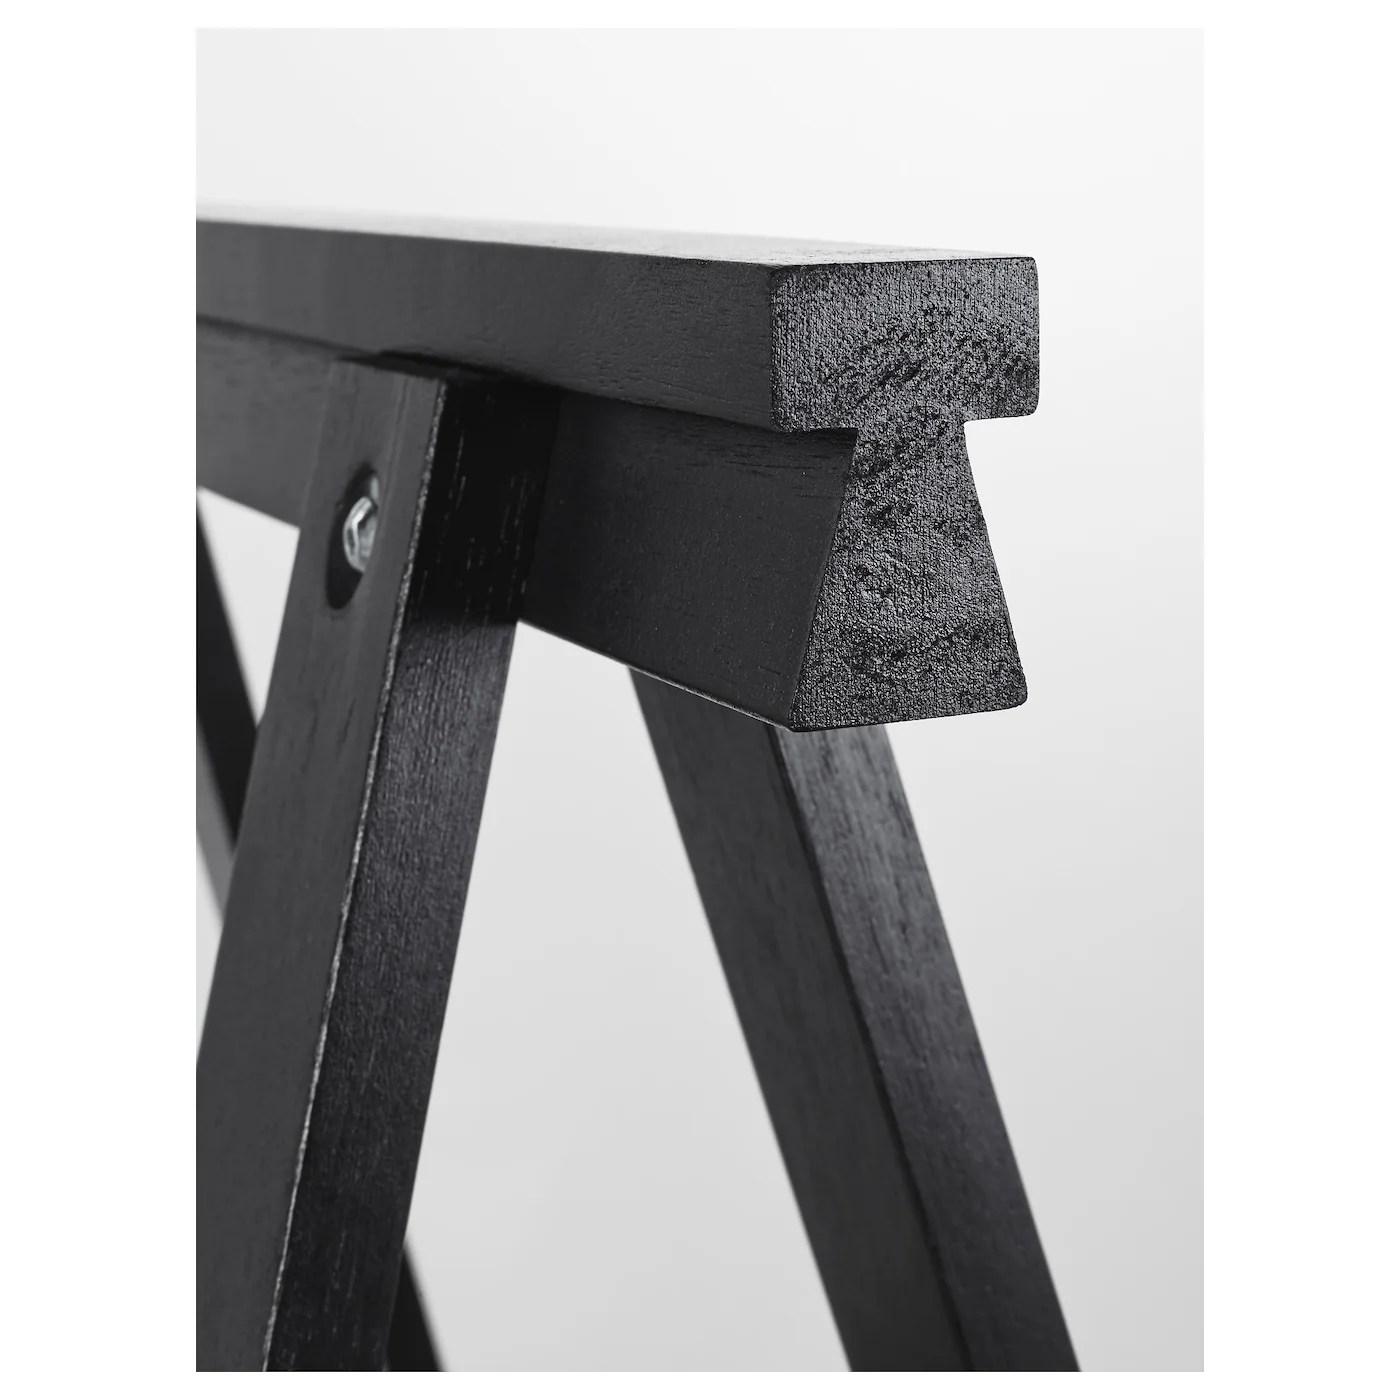 oddvald trestle black 70x70 cm